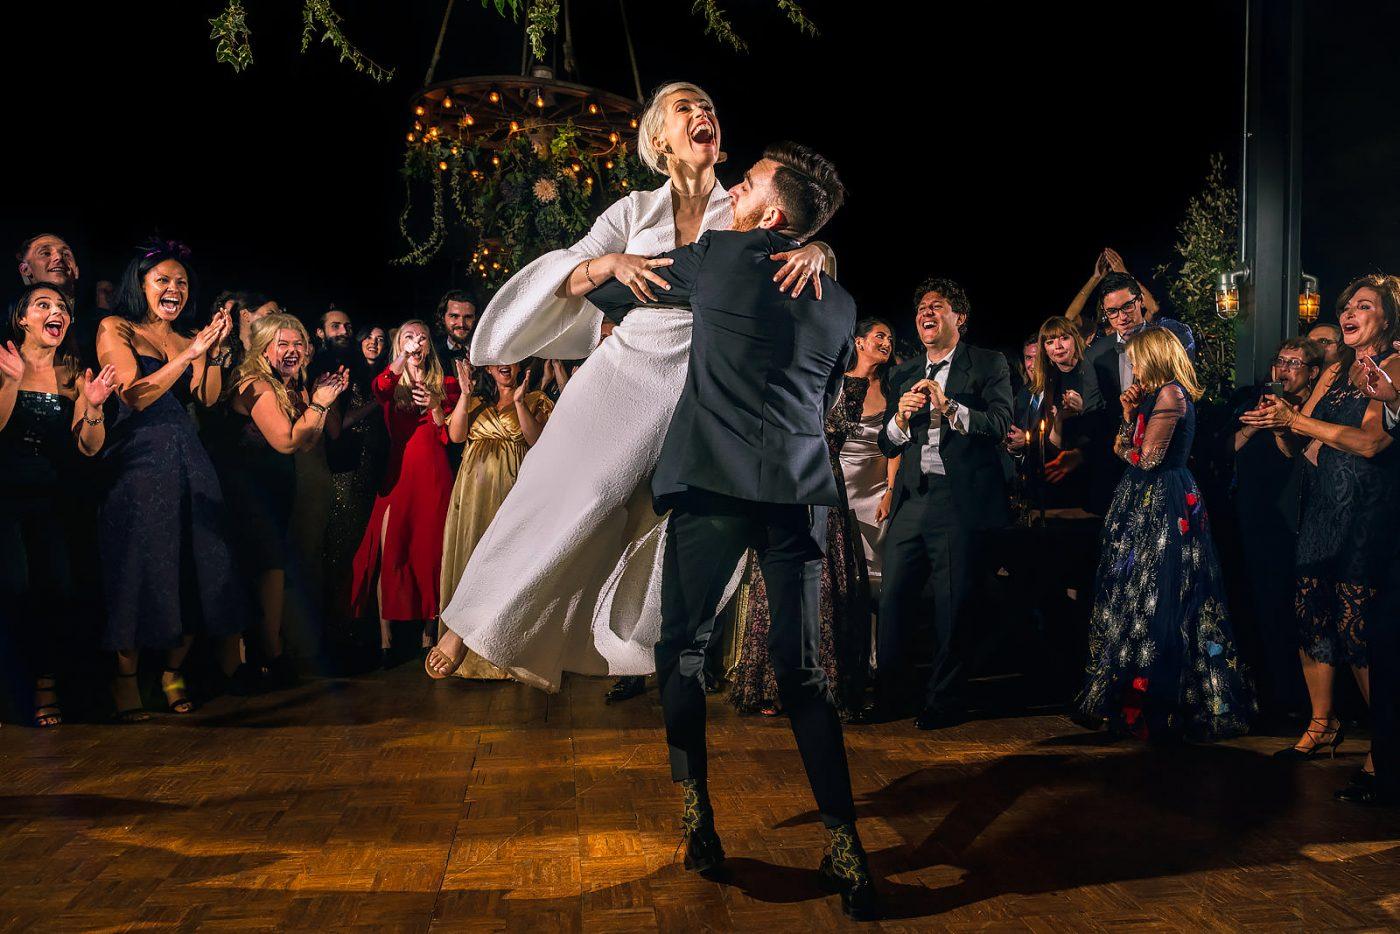 Wedding Photography by Dan Morris Photography